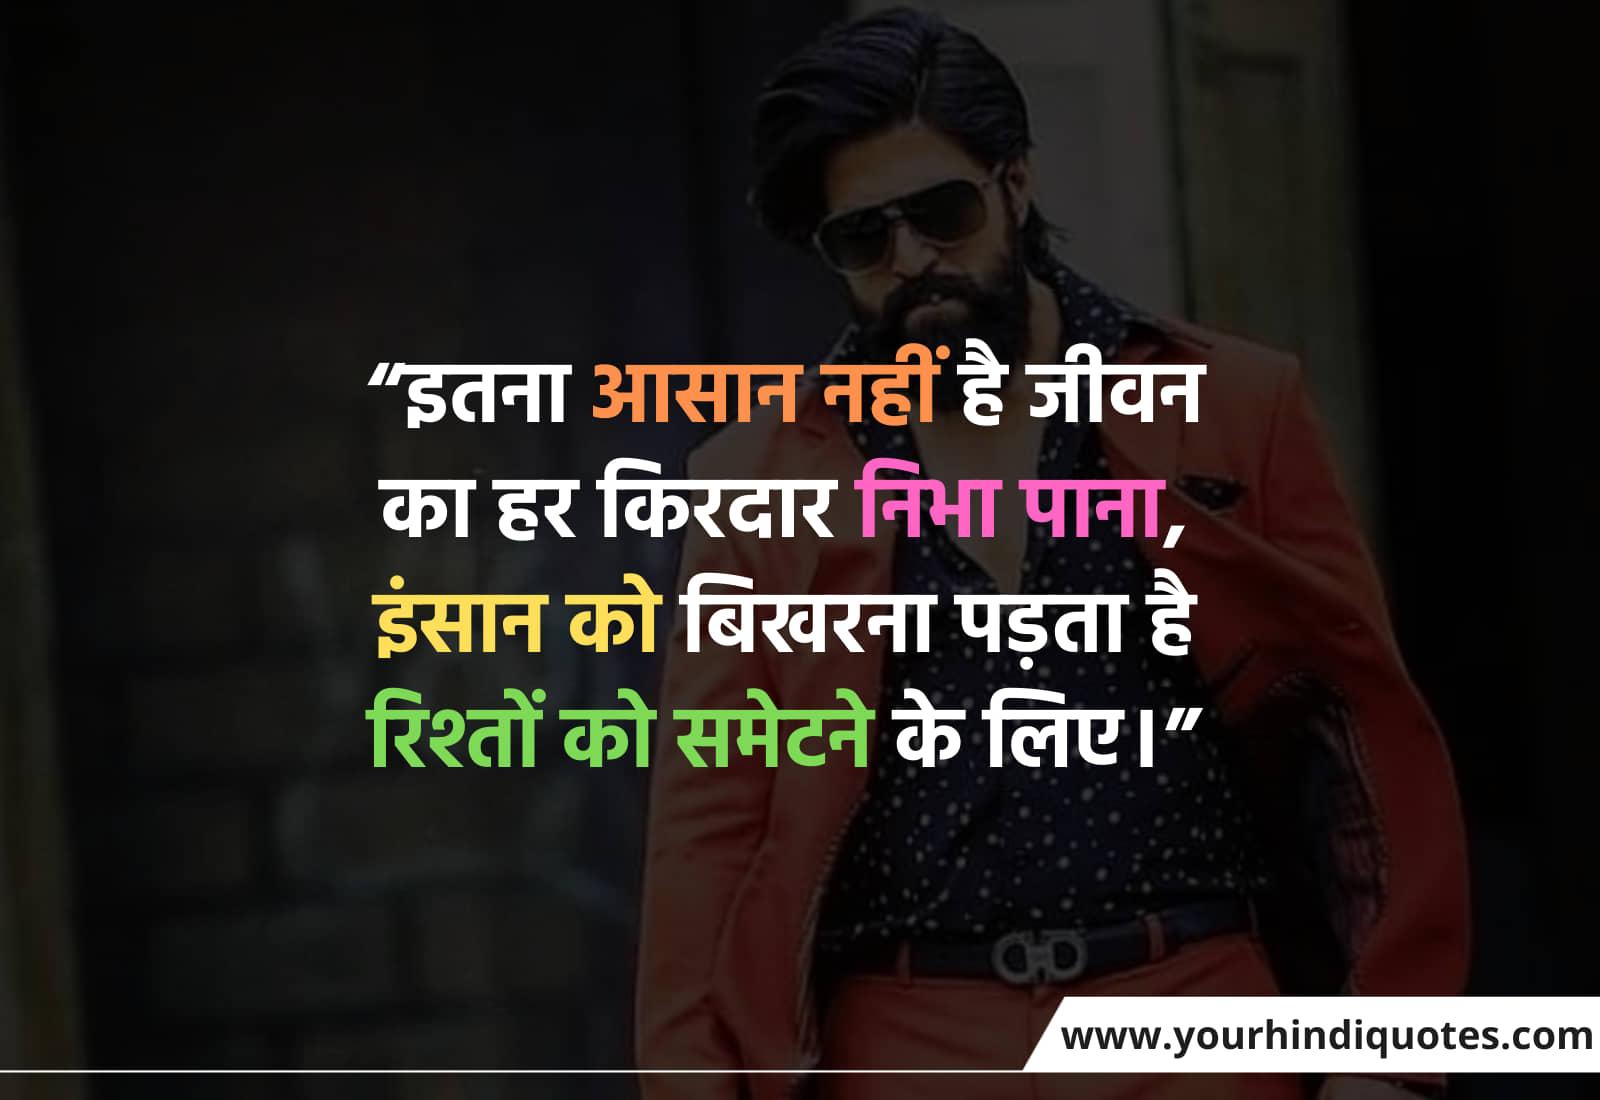 Hindi Relationship Quotes